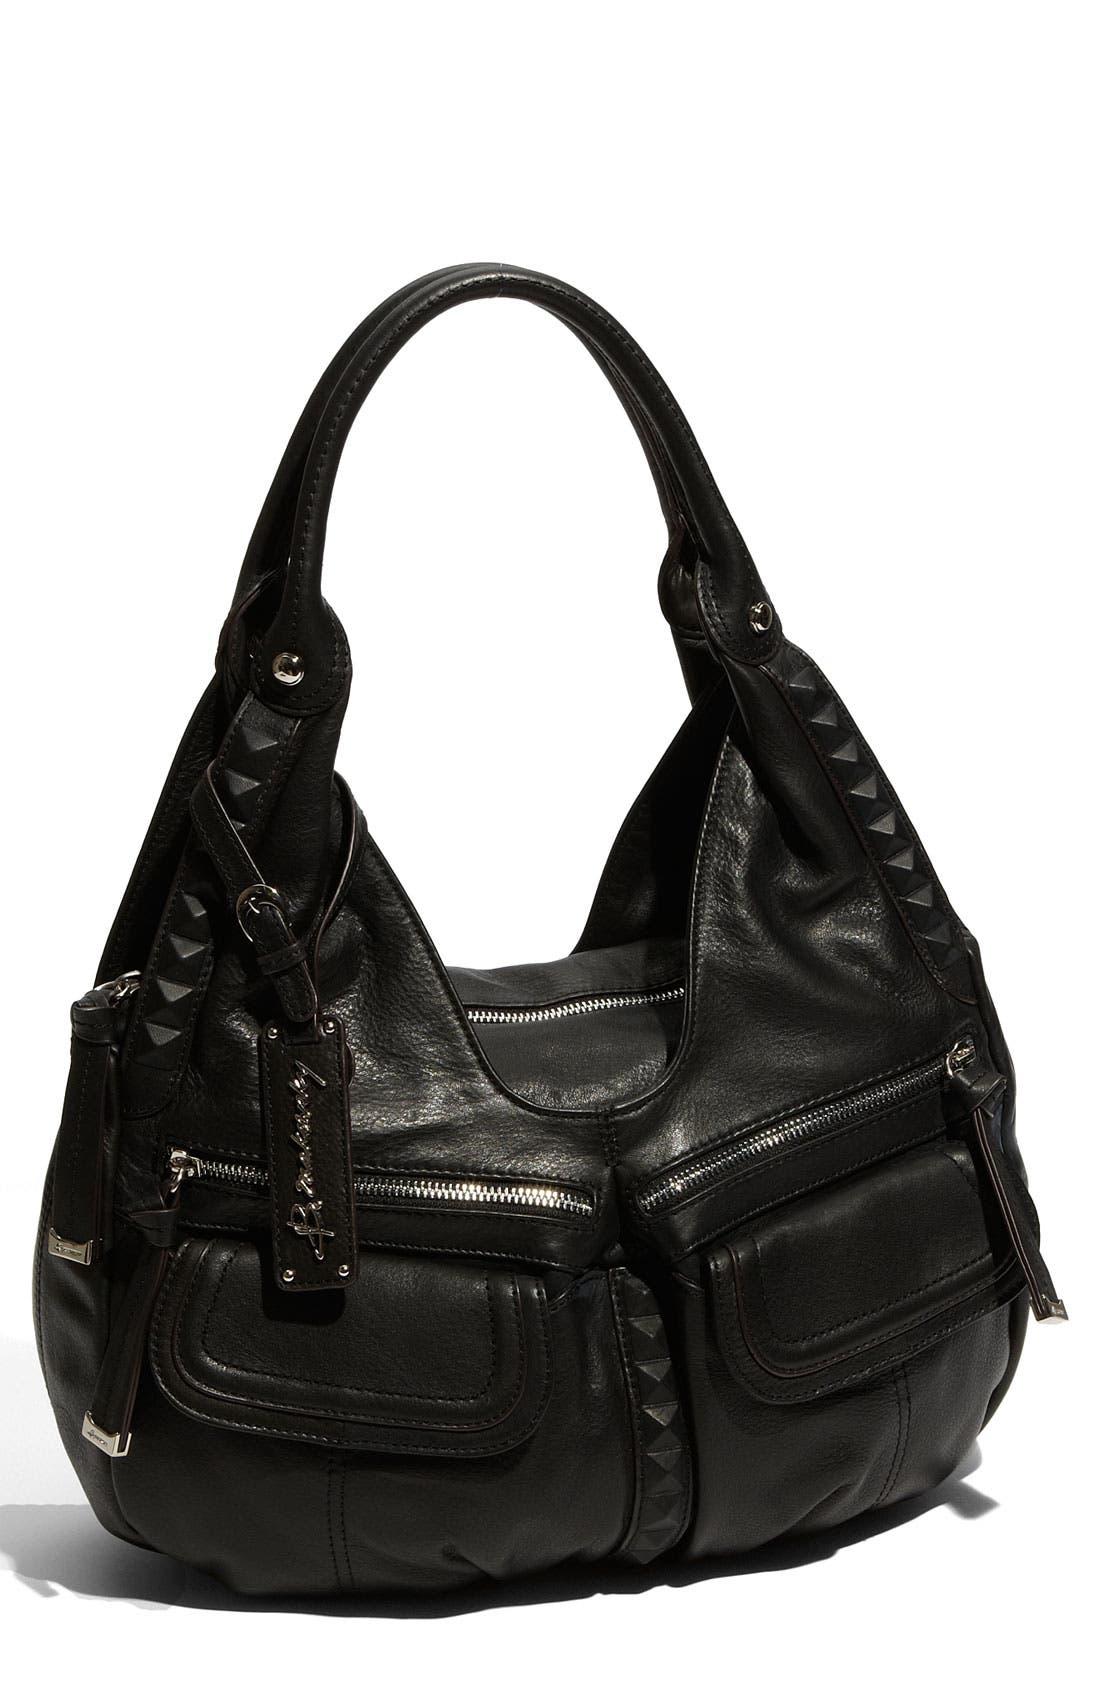 Alternate Image 1 Selected - B. Makowsky 'Stanton' Leather Satchel